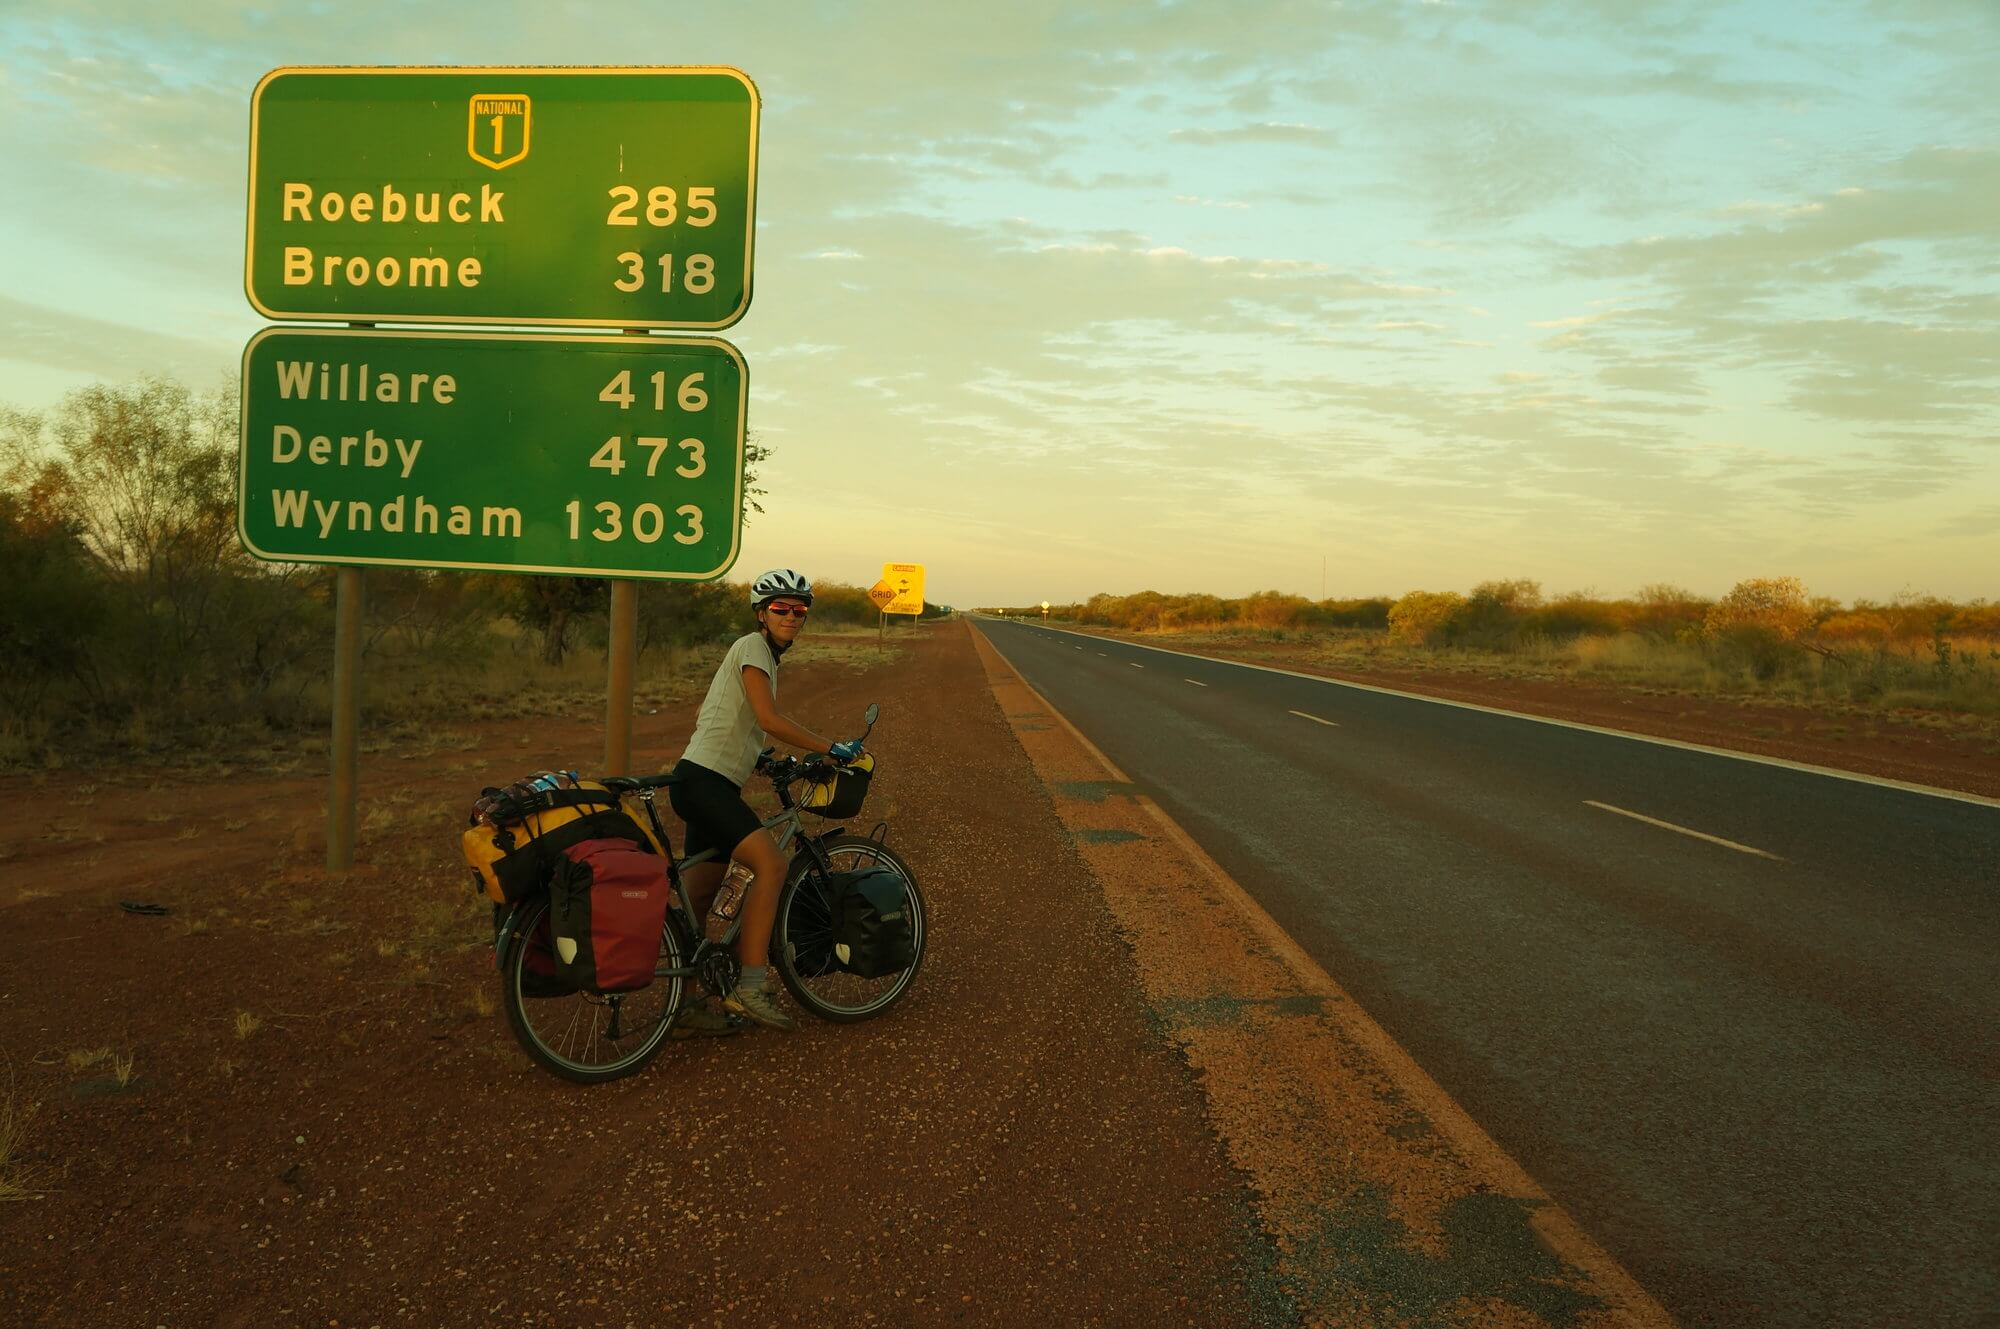 australia-zachodnia-port-hedland-broome-3